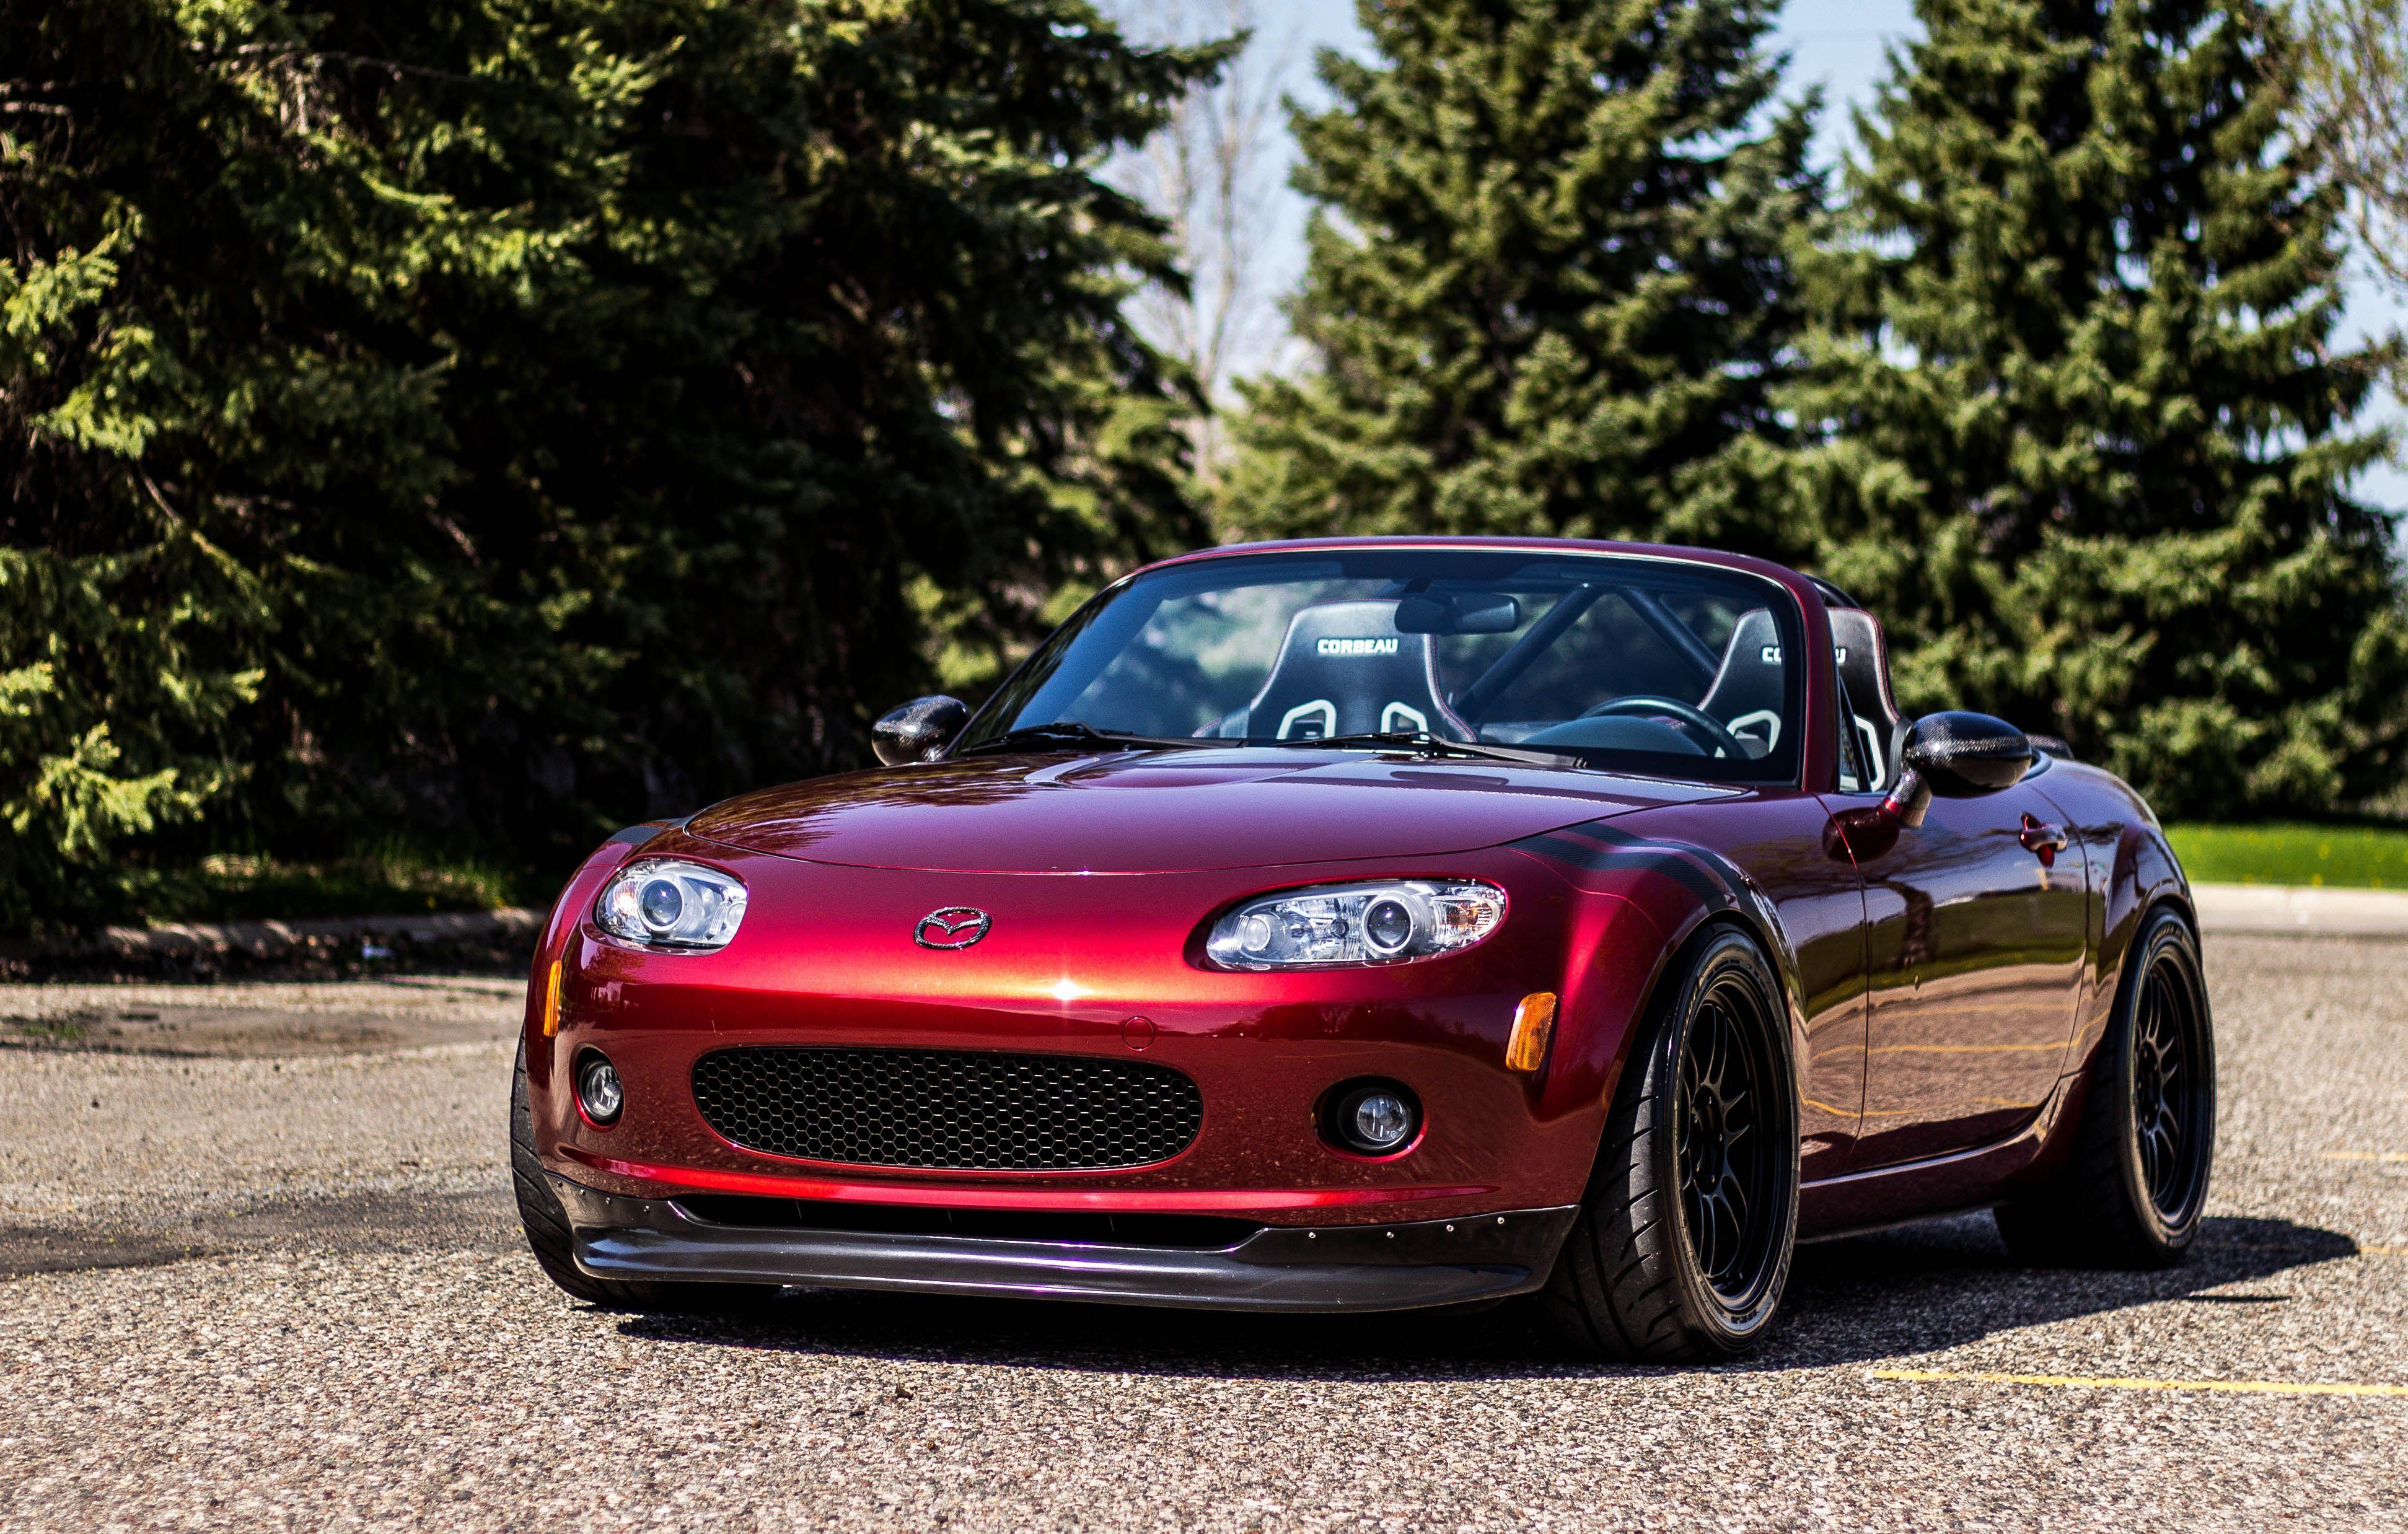 NC belonging to Ne0z - Miata net forum | miata | Mazda, Mazda mx, Cars